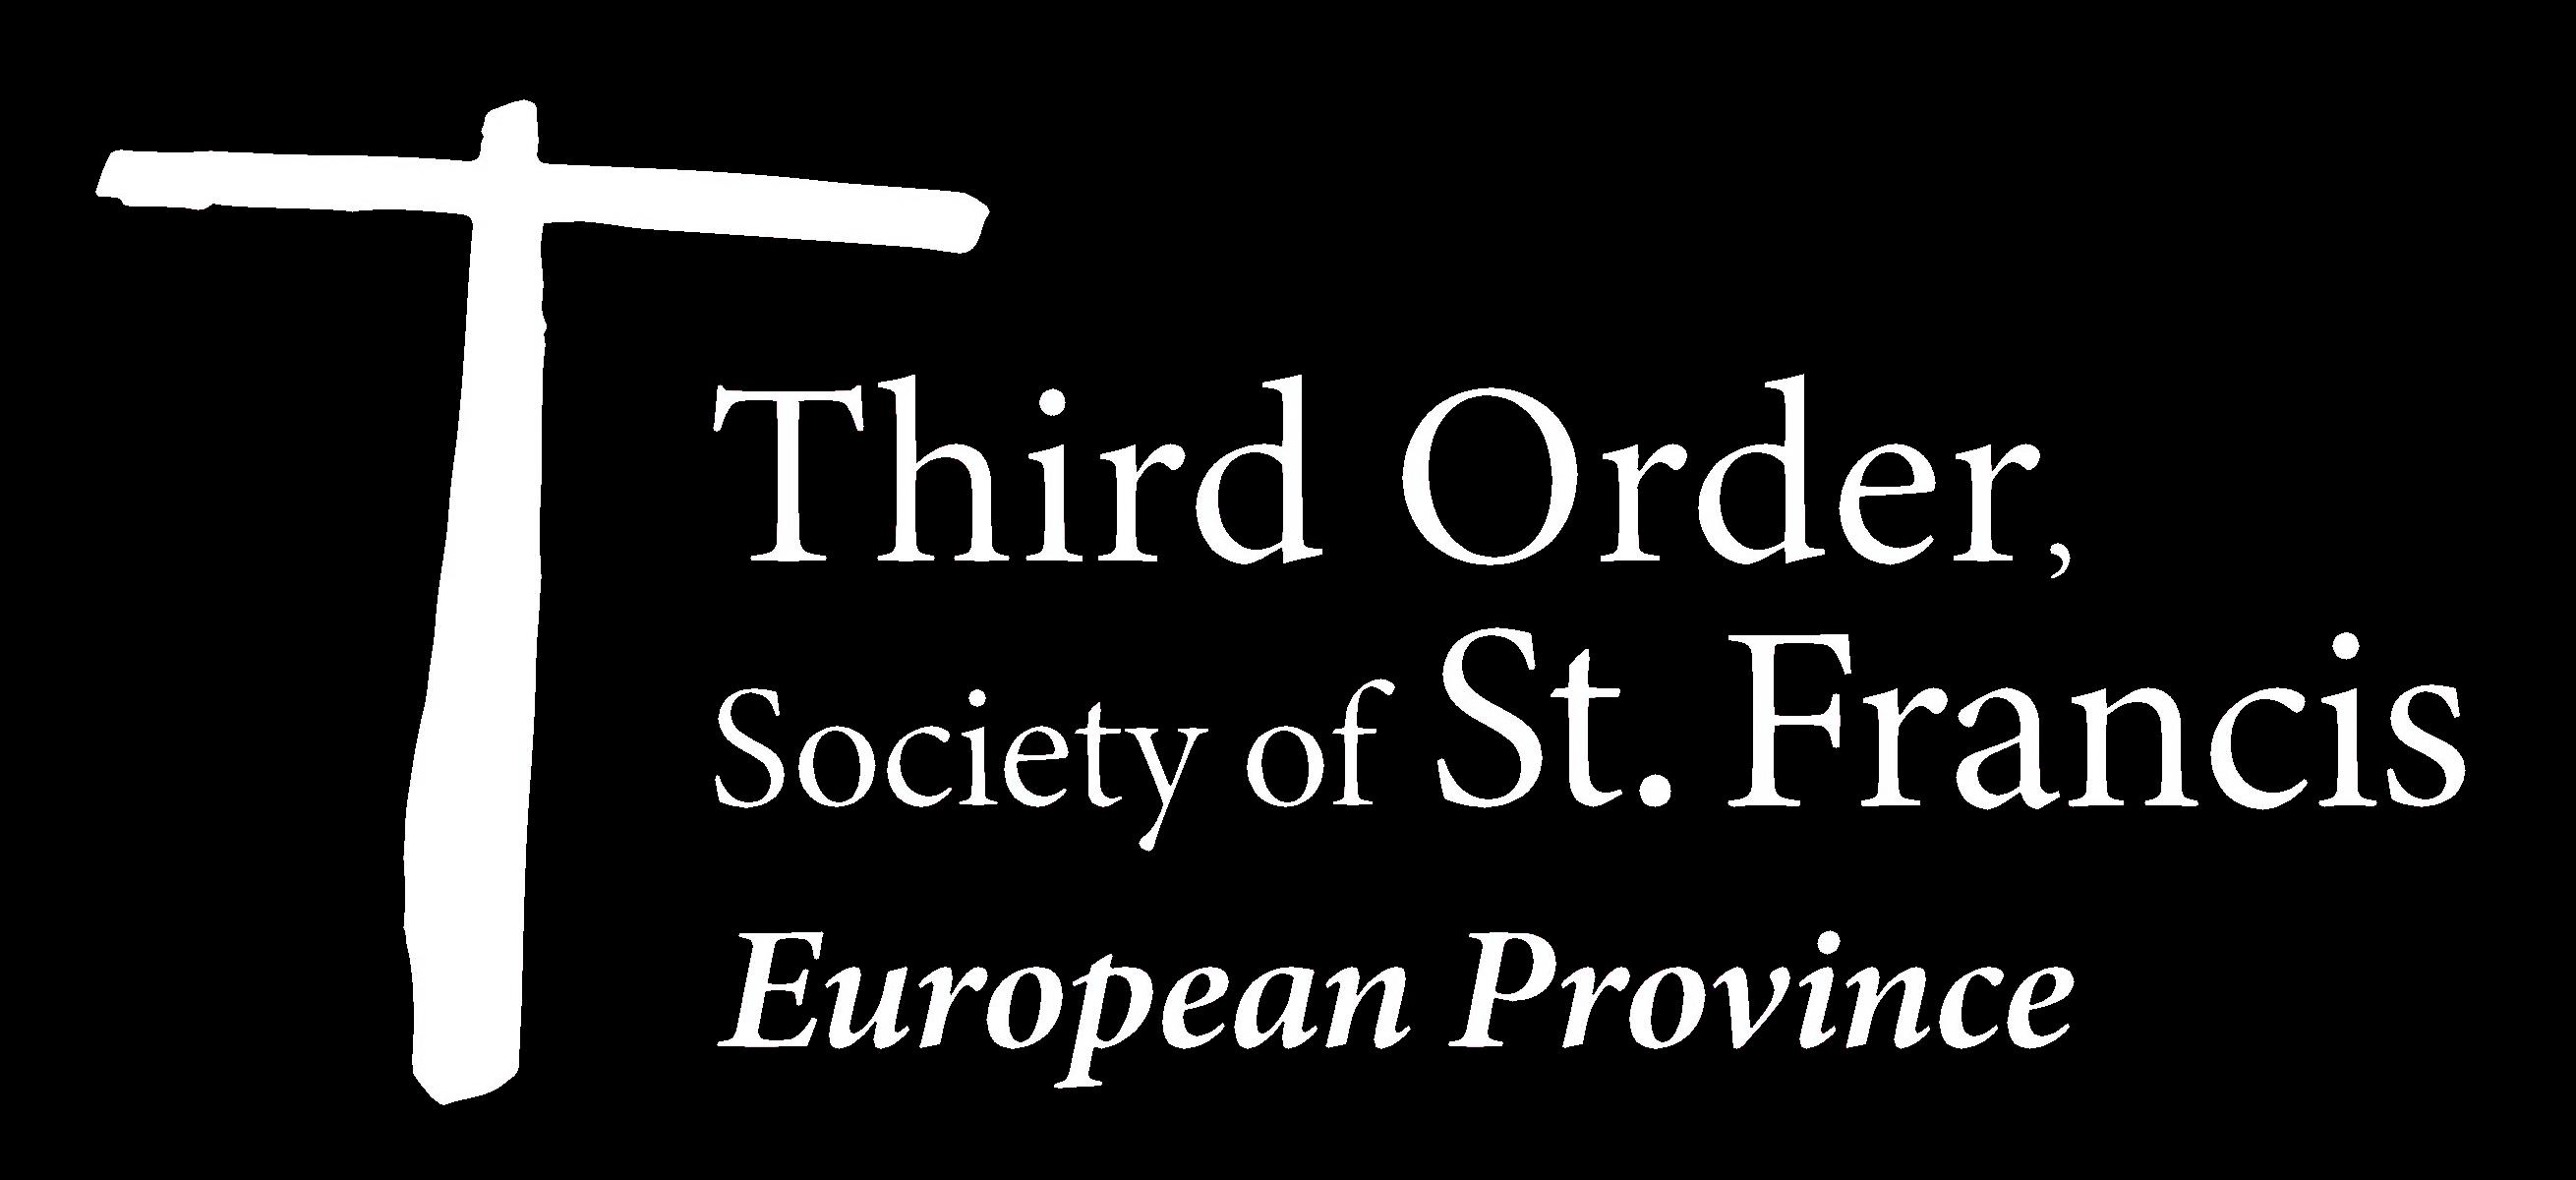 TSSF EUROPEAN PROVINCE